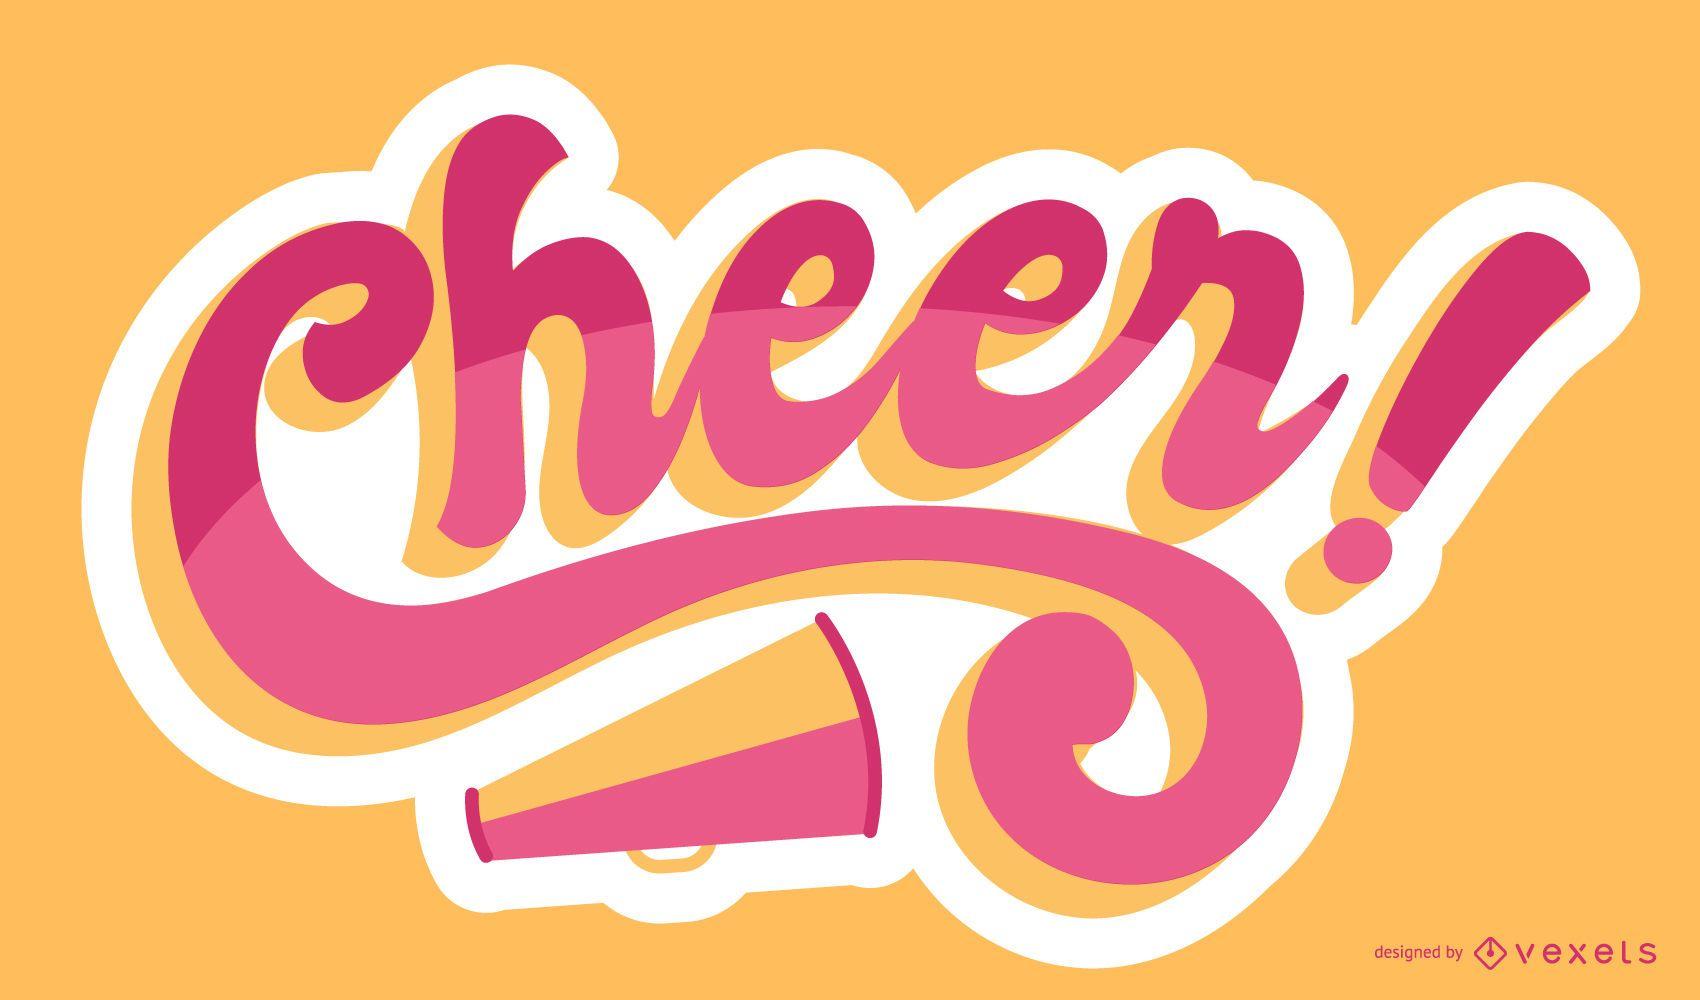 Cheer lettering design